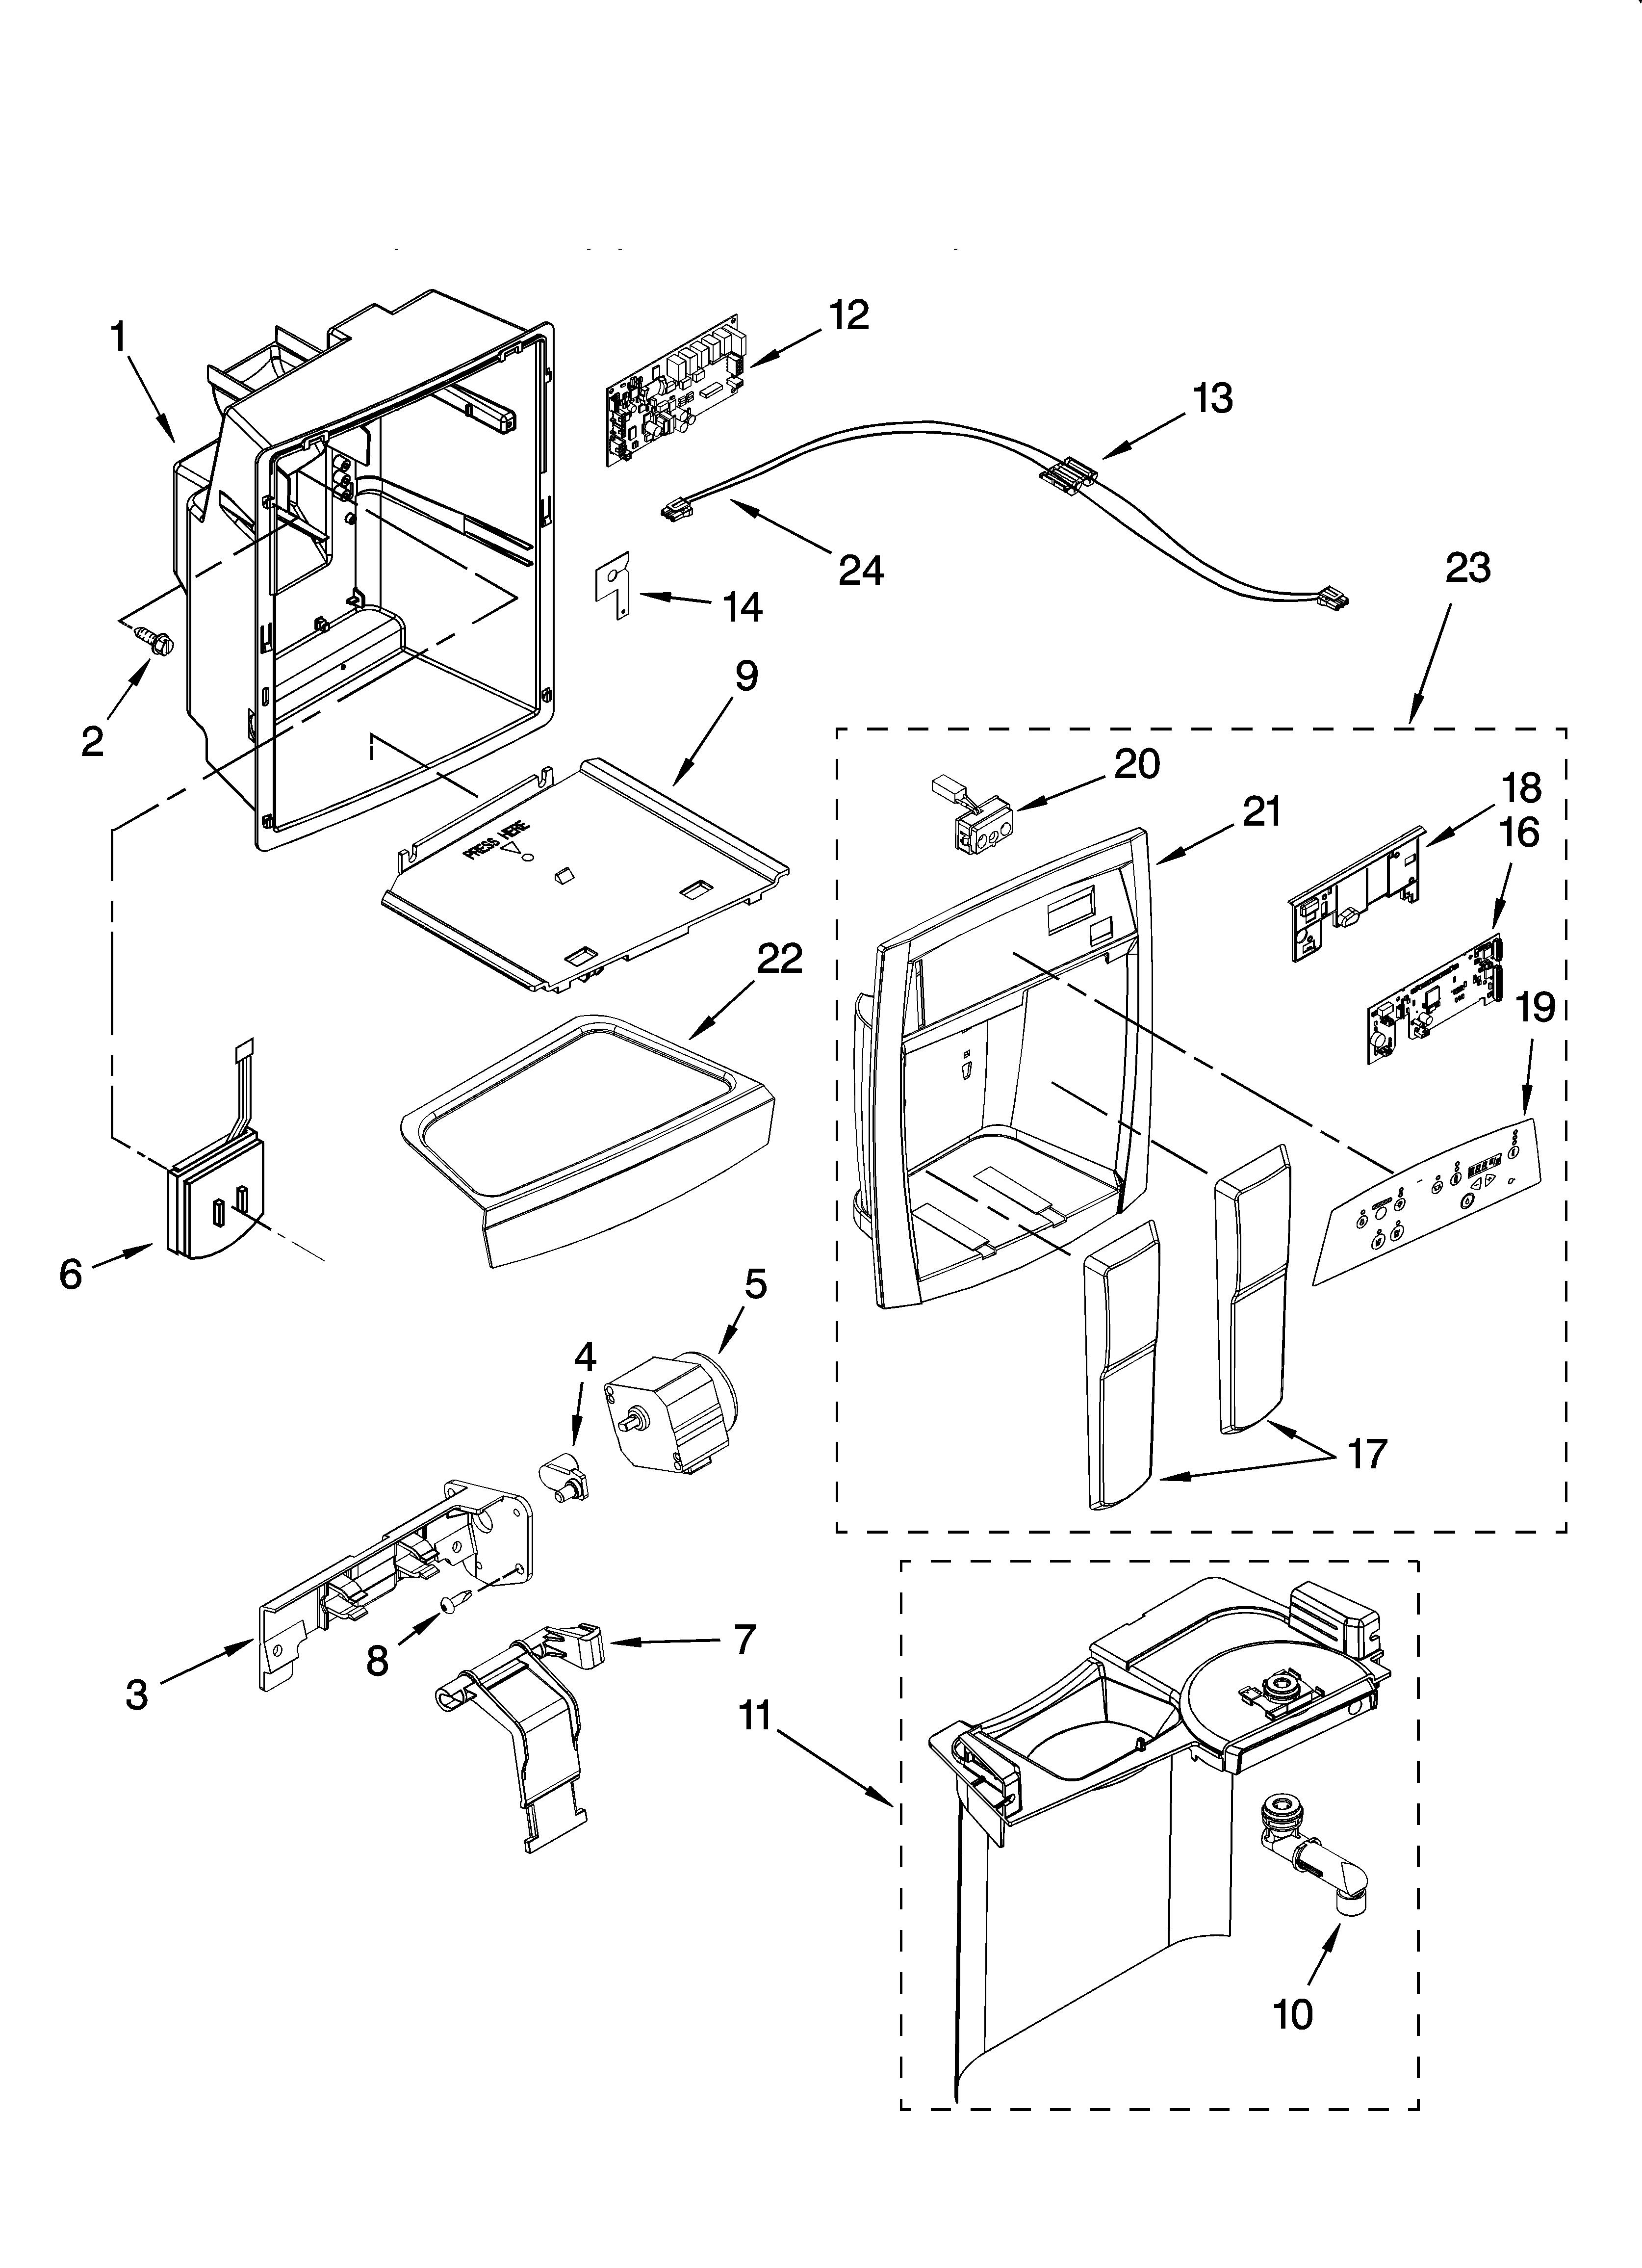 Refrigerated: Whirlpool Gold Refrigerator Parts